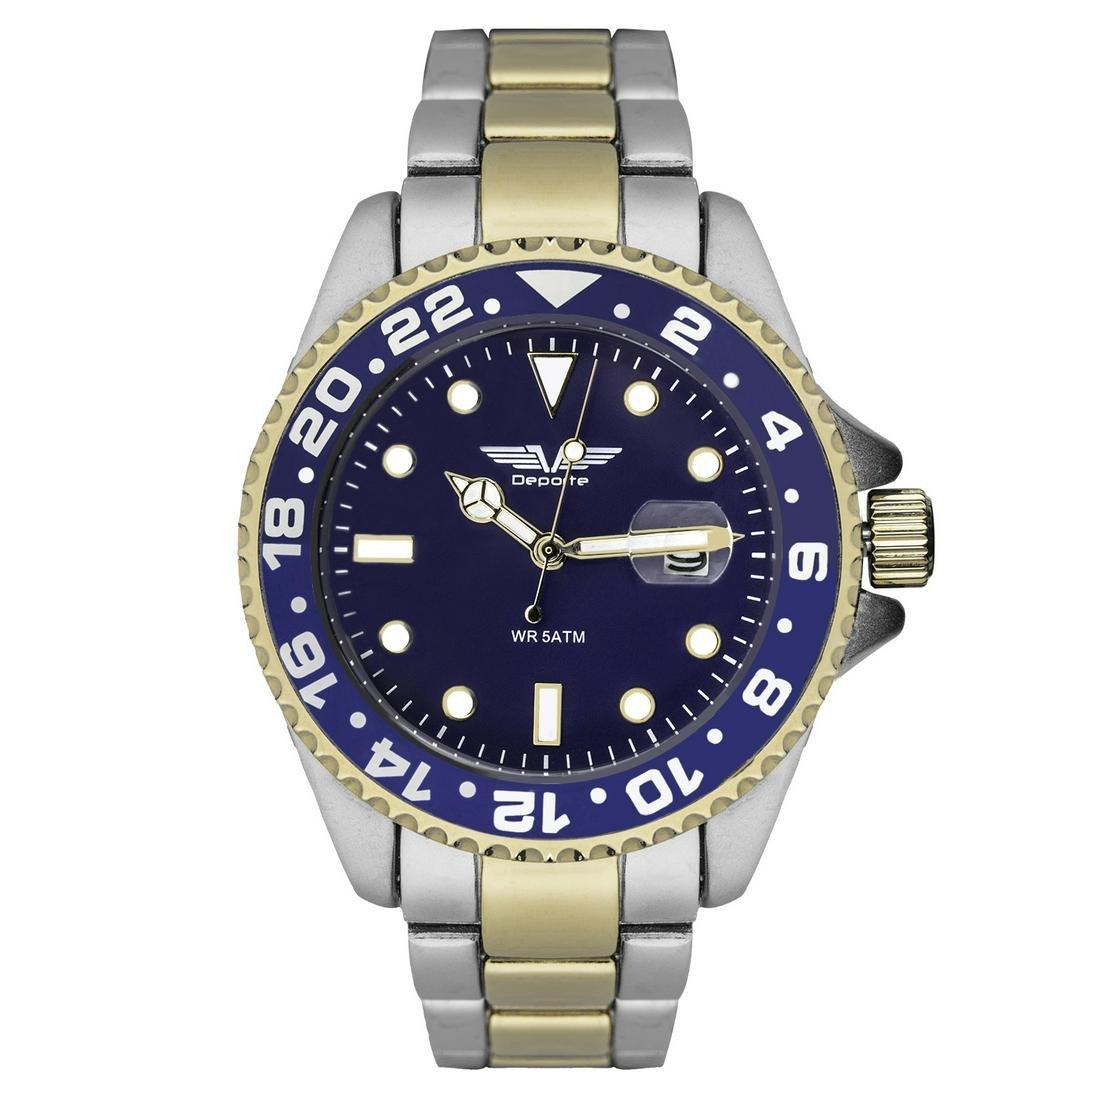 Deporte Pacific Men's Diver Style Watch